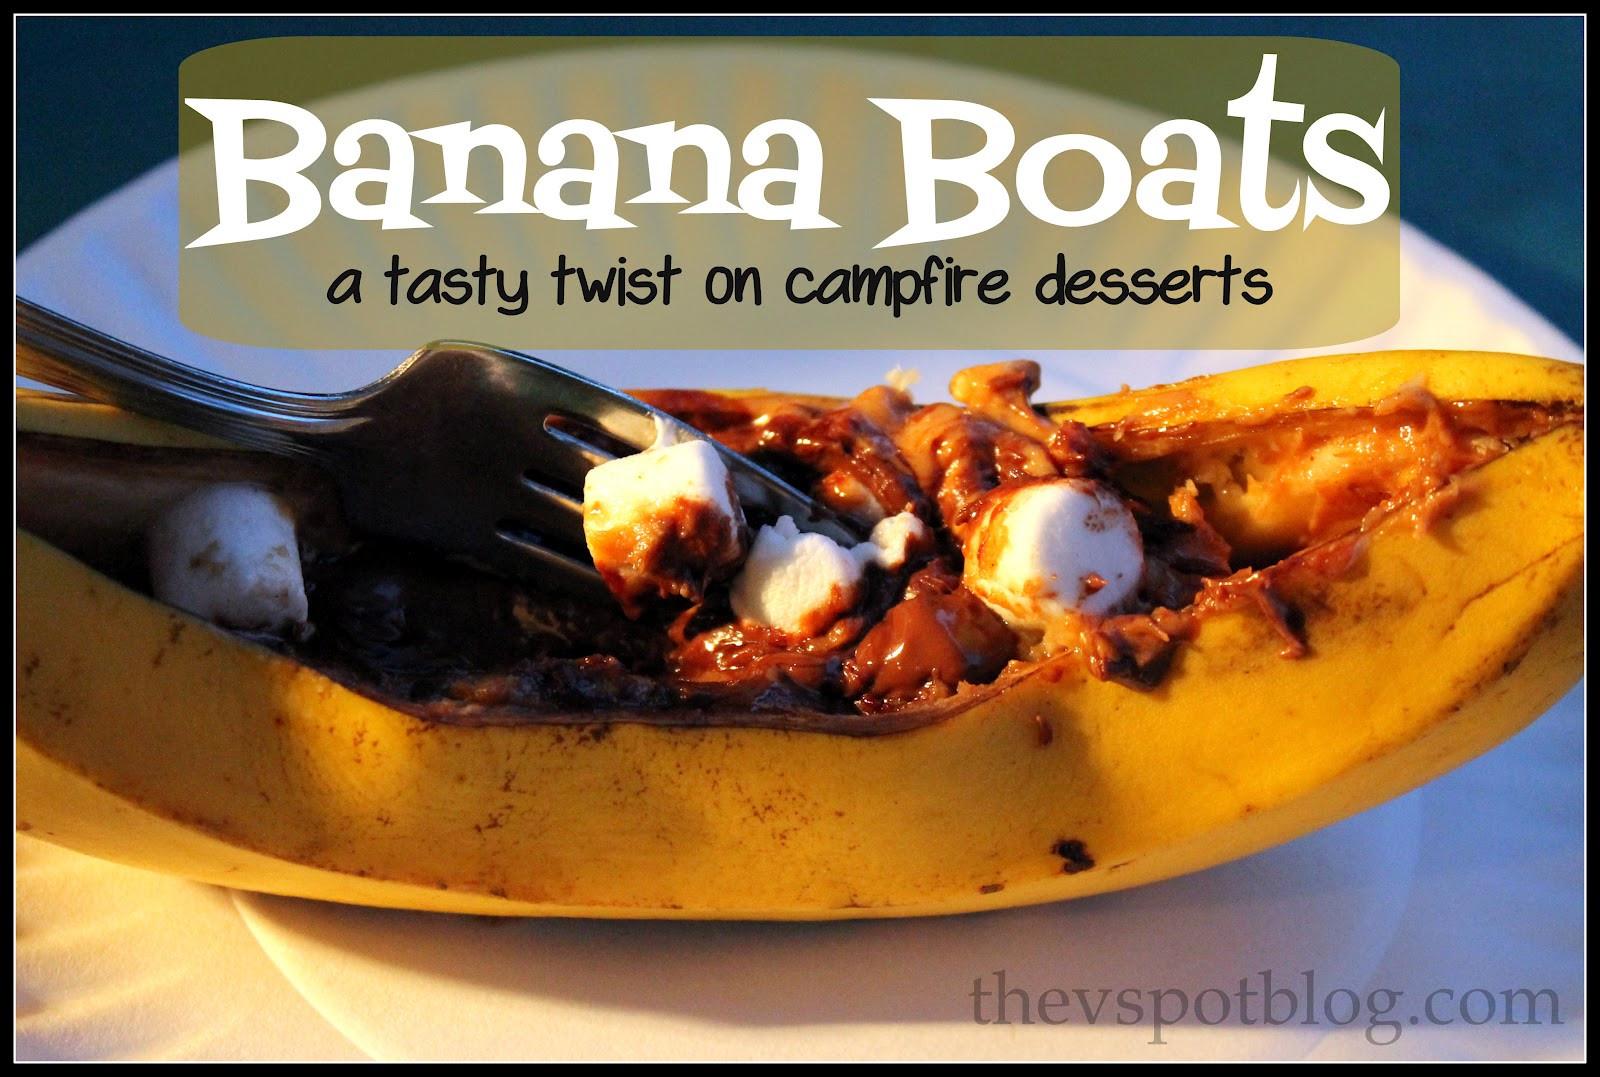 Campfire Dessert Recipes  Banana Boats a tasty twist on campfire desserts